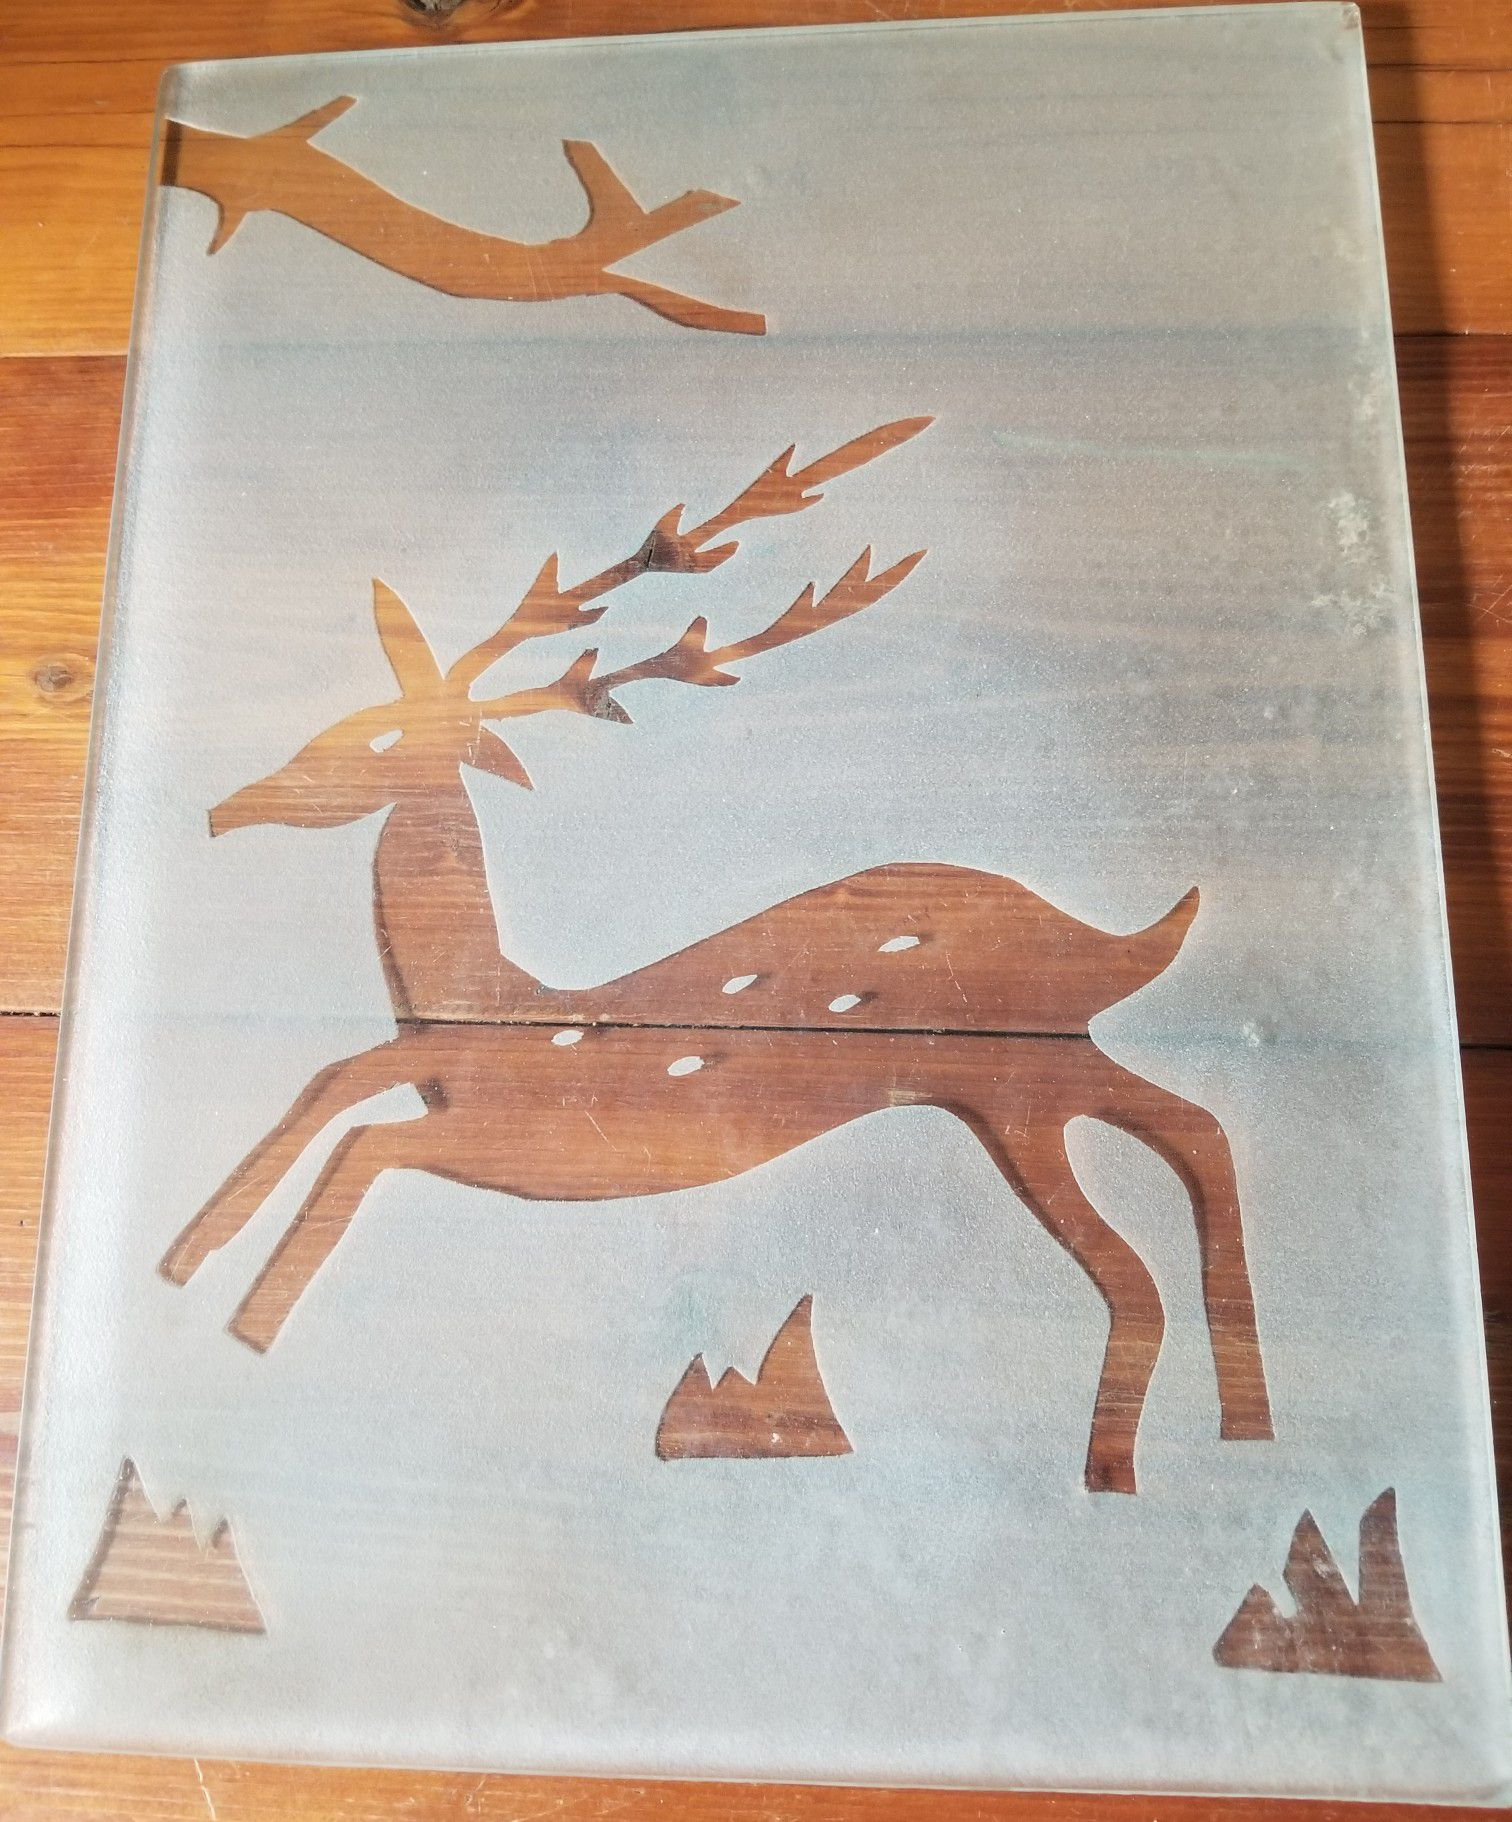 Reindeer deer frosted glass heavy duty nice